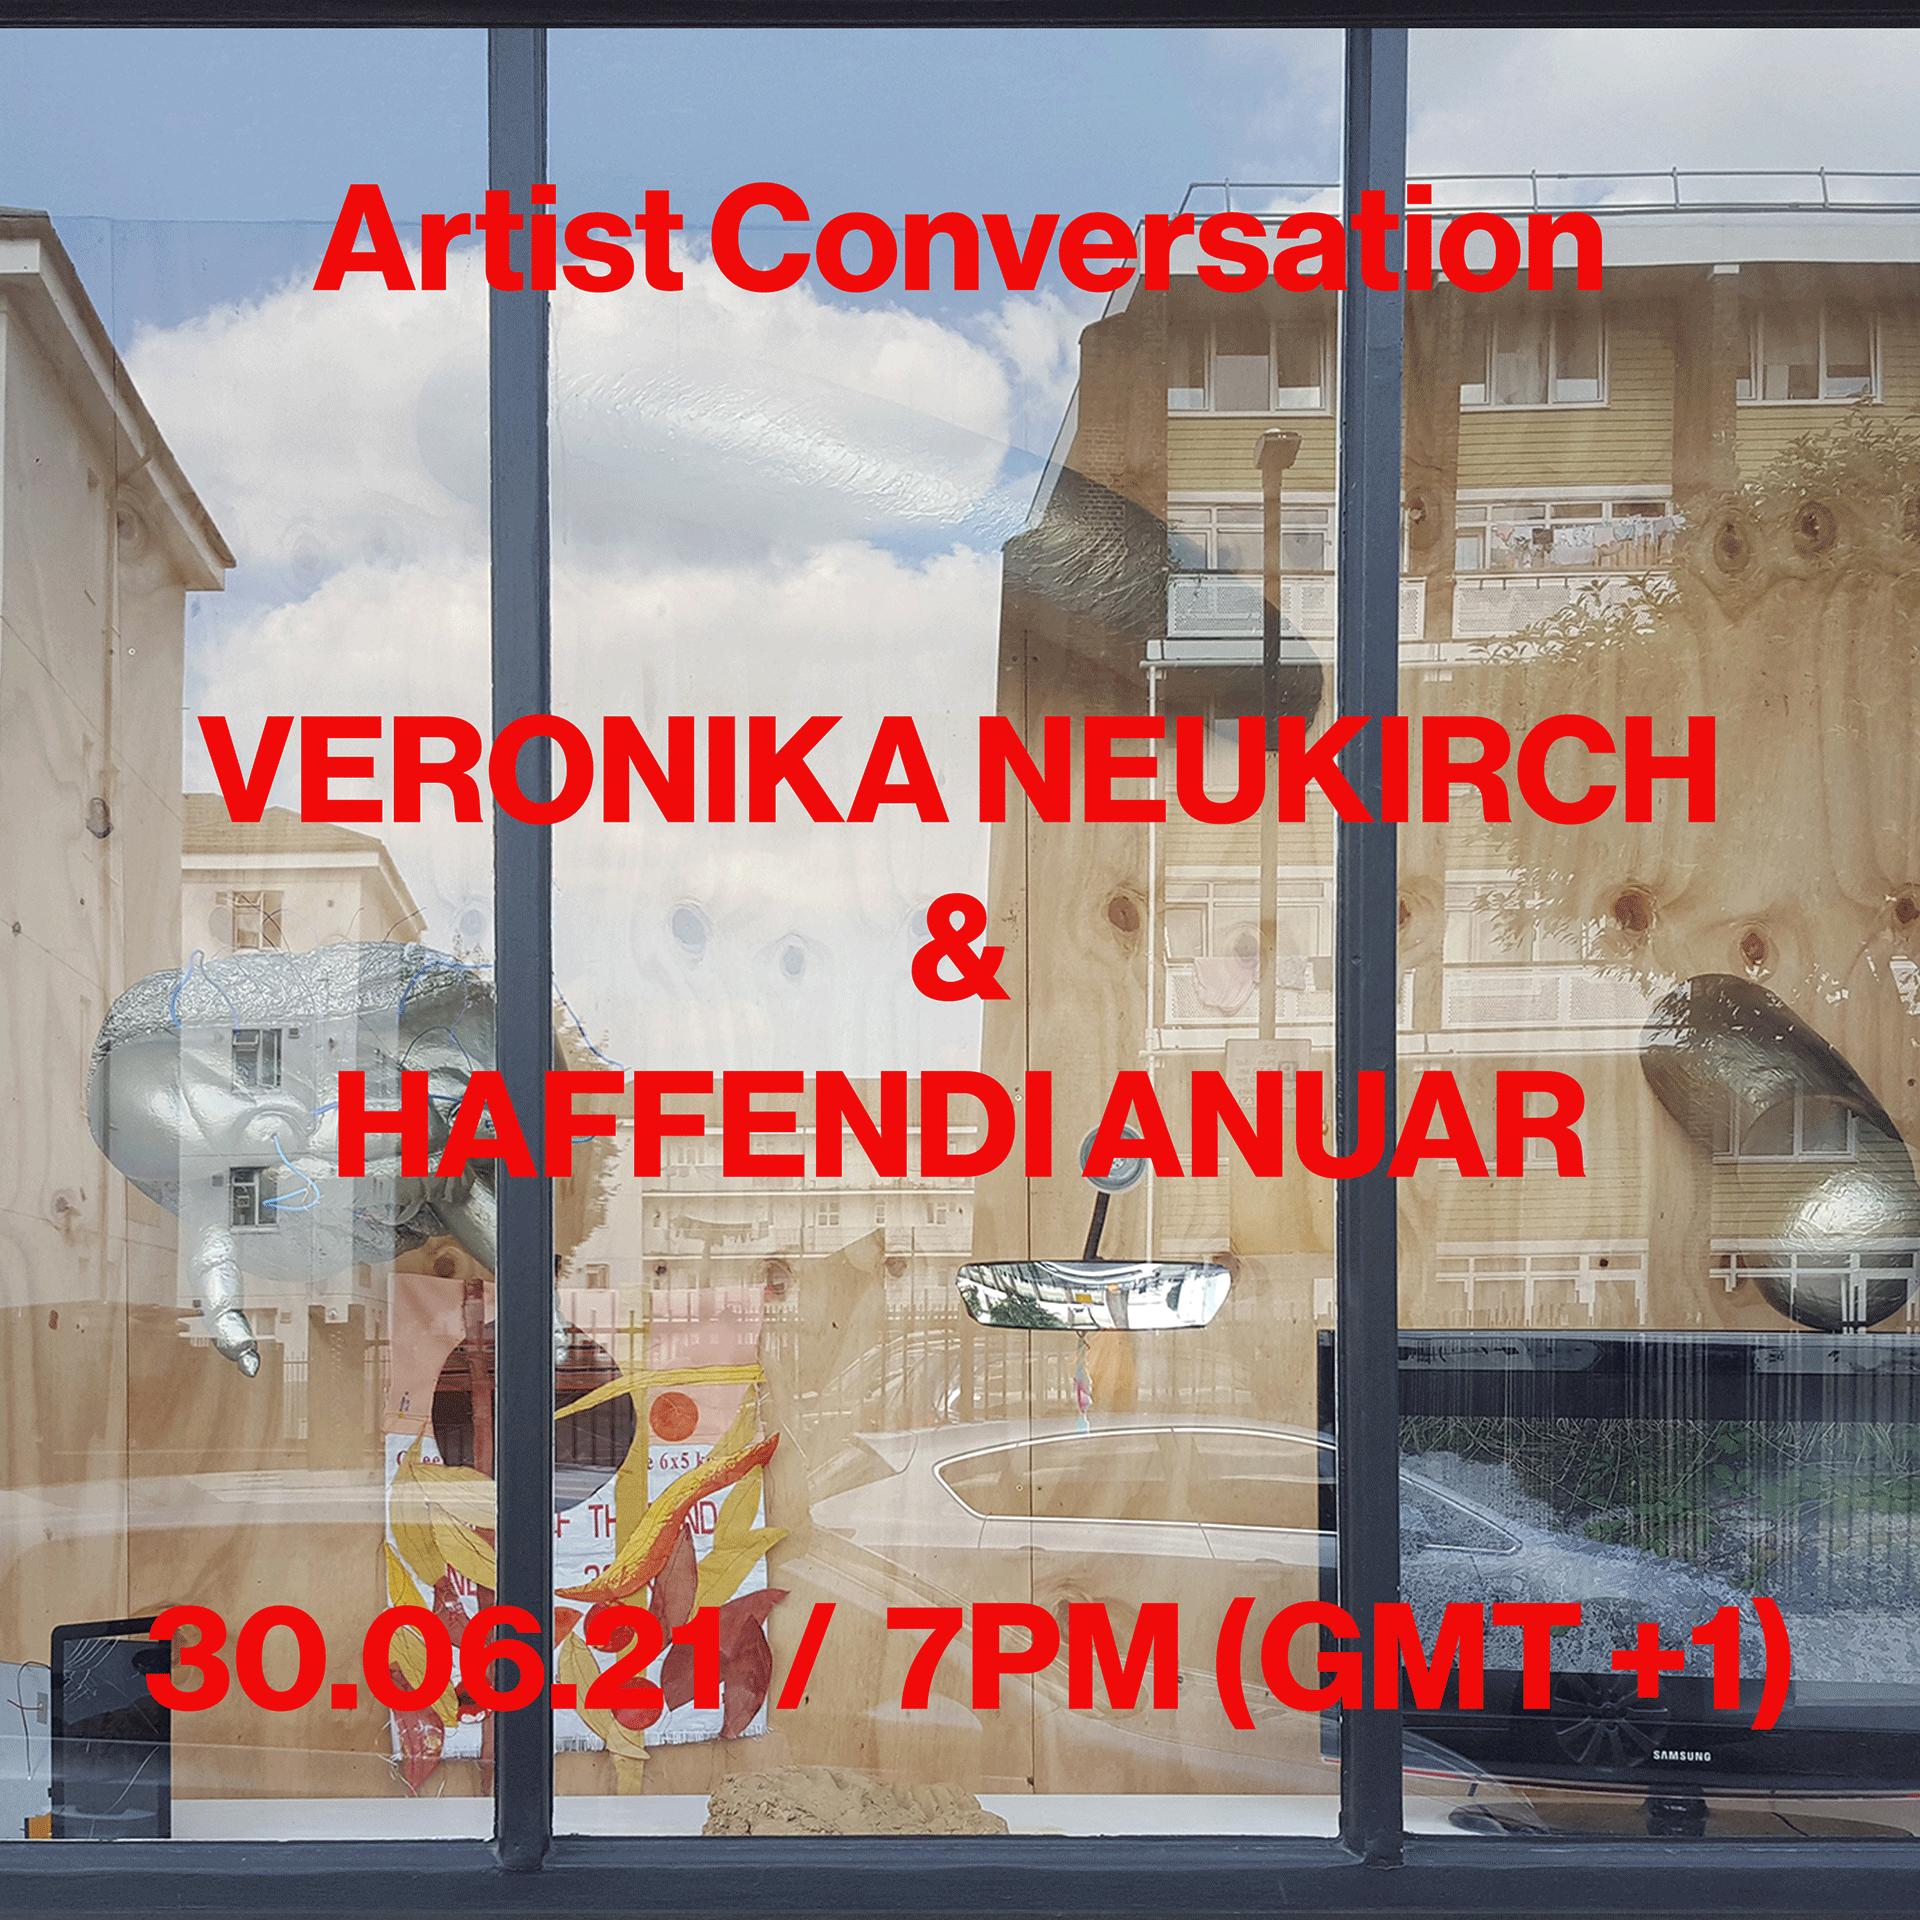 Artist Conversation, Veronika Neukirch & Haffendi Anuar